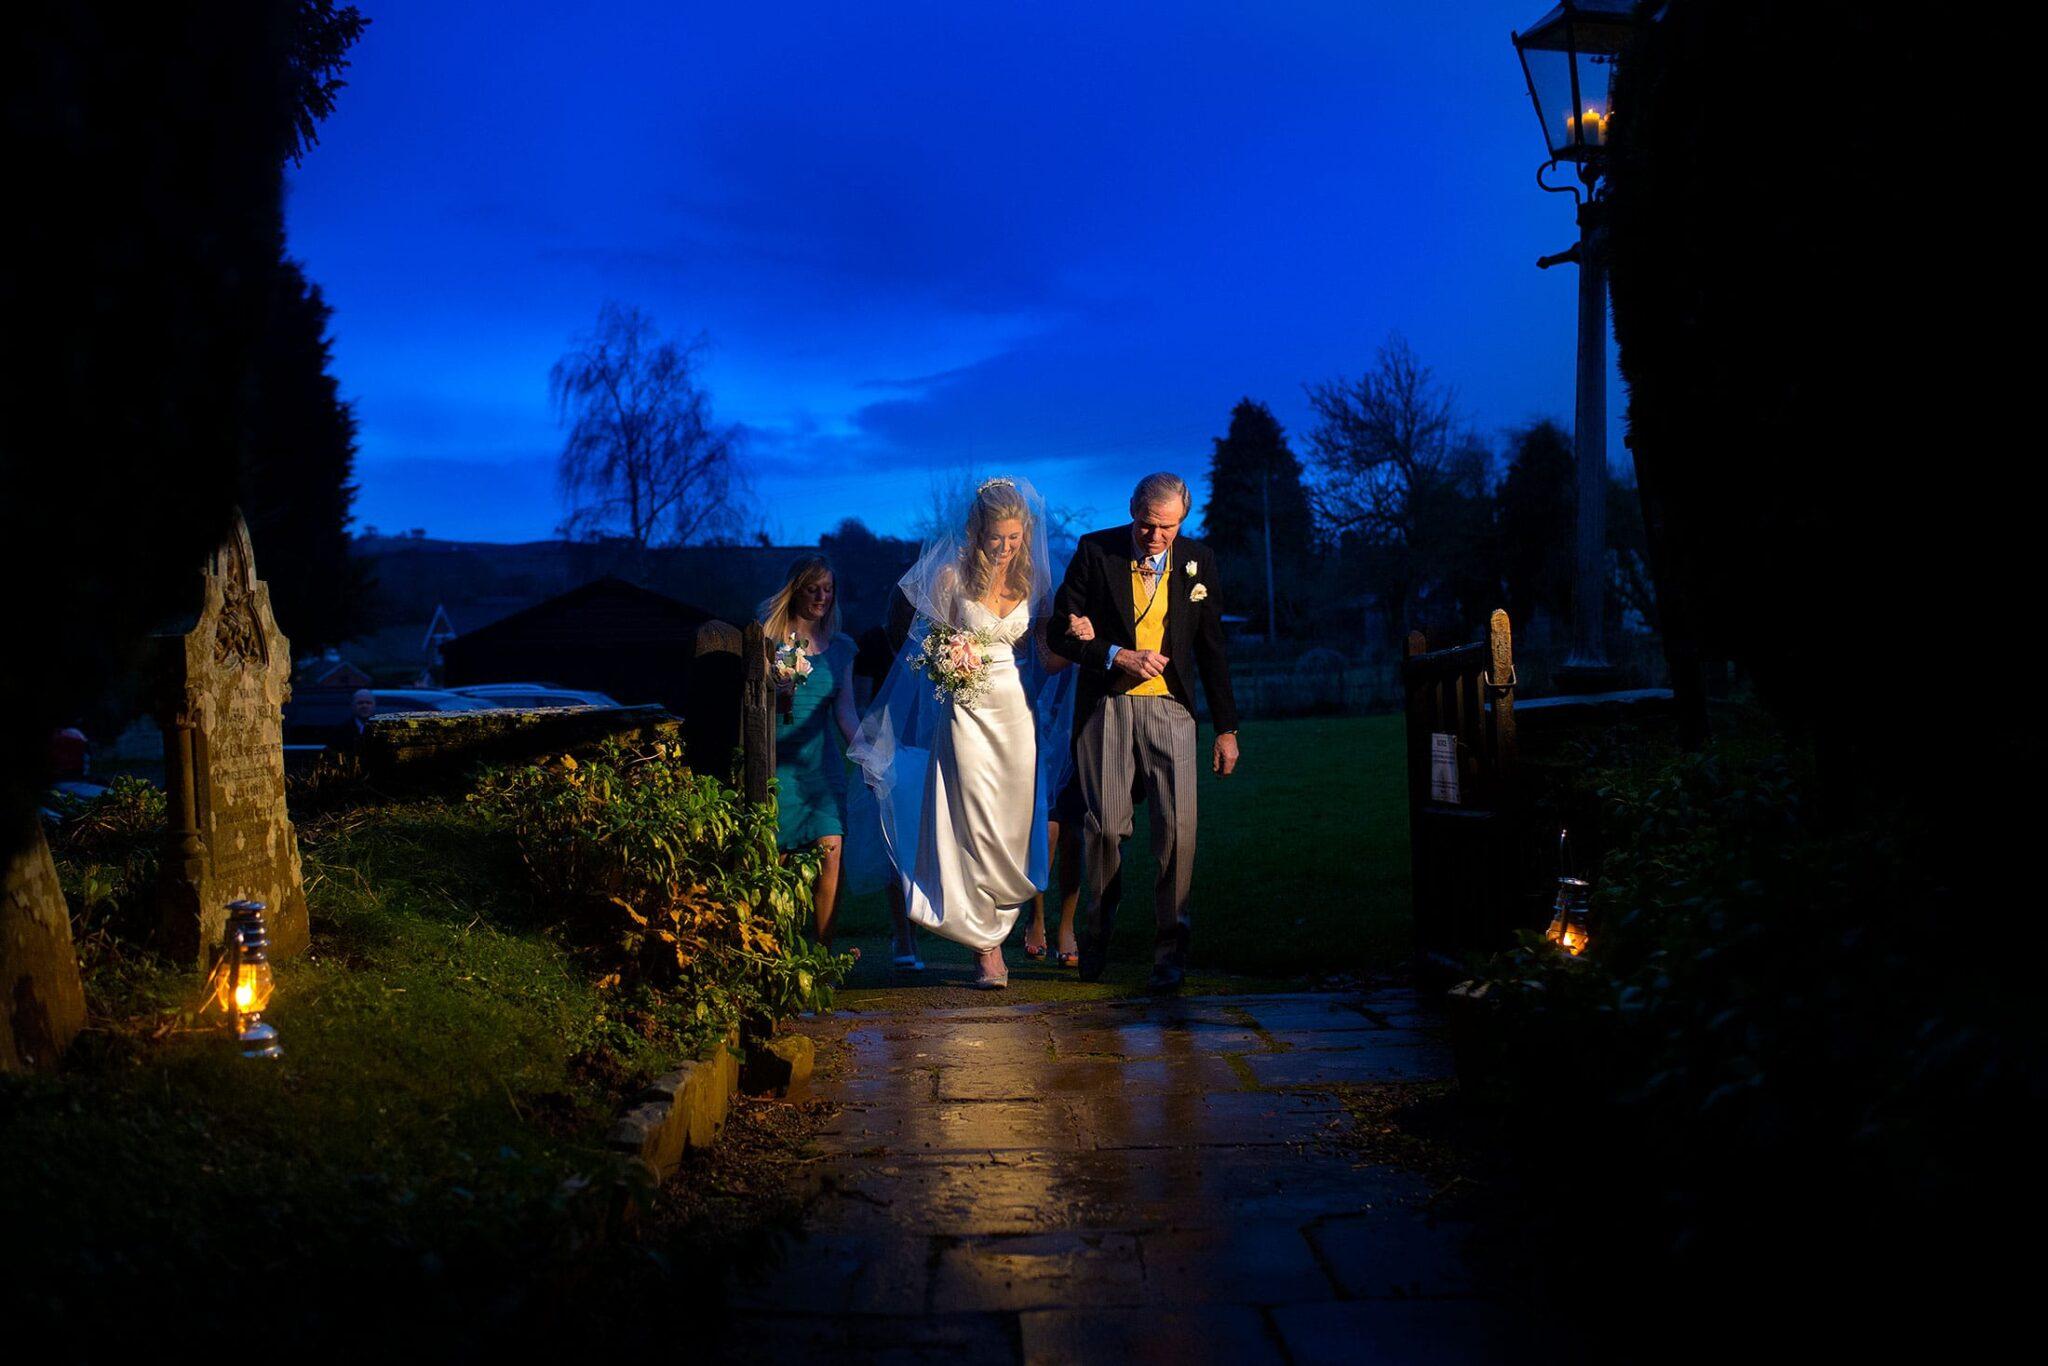 Herefordshire wedding photography of Iona and Greg